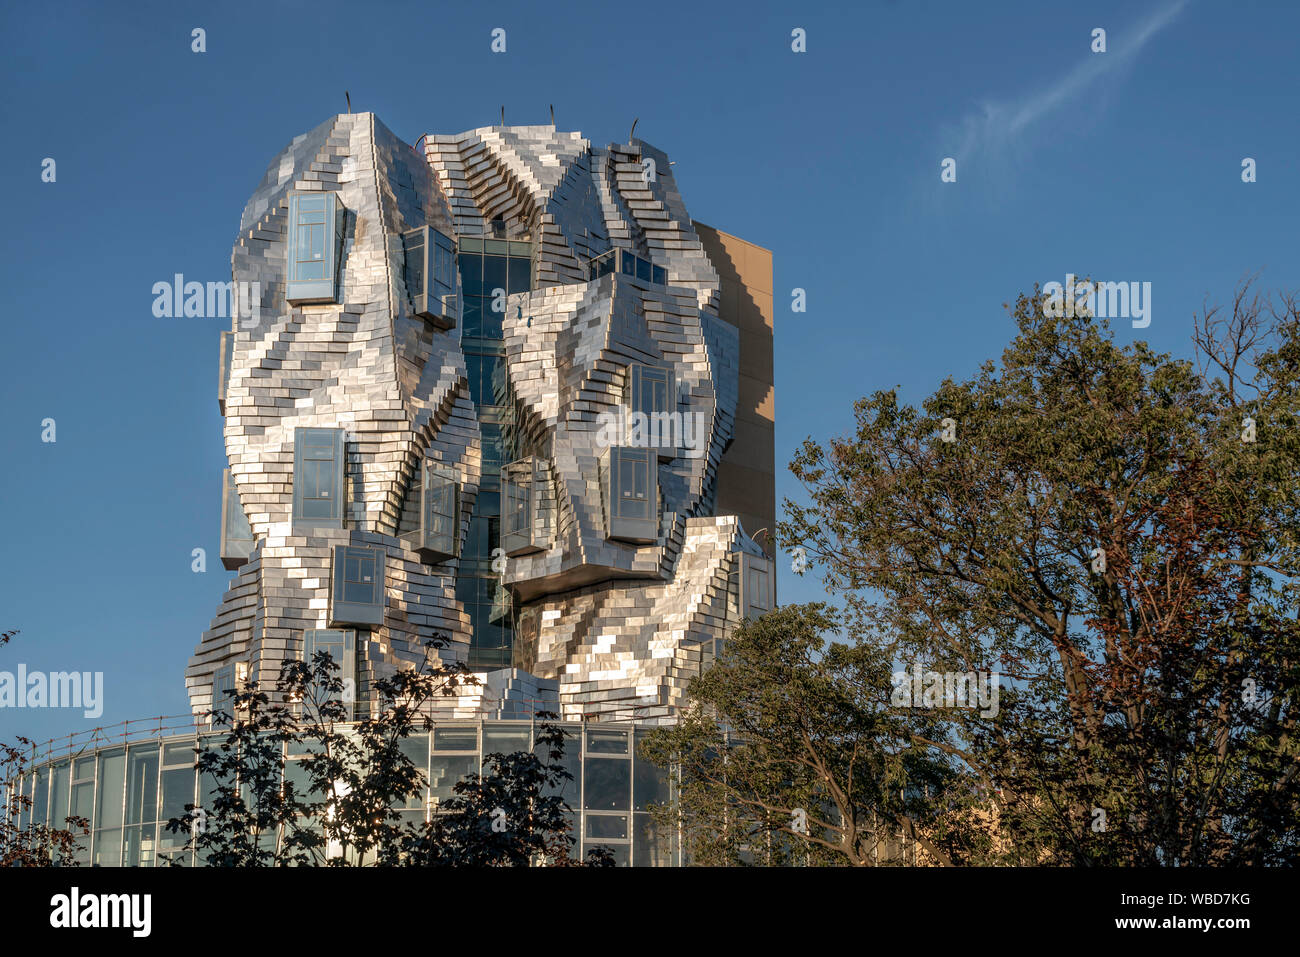 LUMA Arles, centro de cultura por el arquitecto Frank Gehry Arles, Provence, Francia Foto de stock